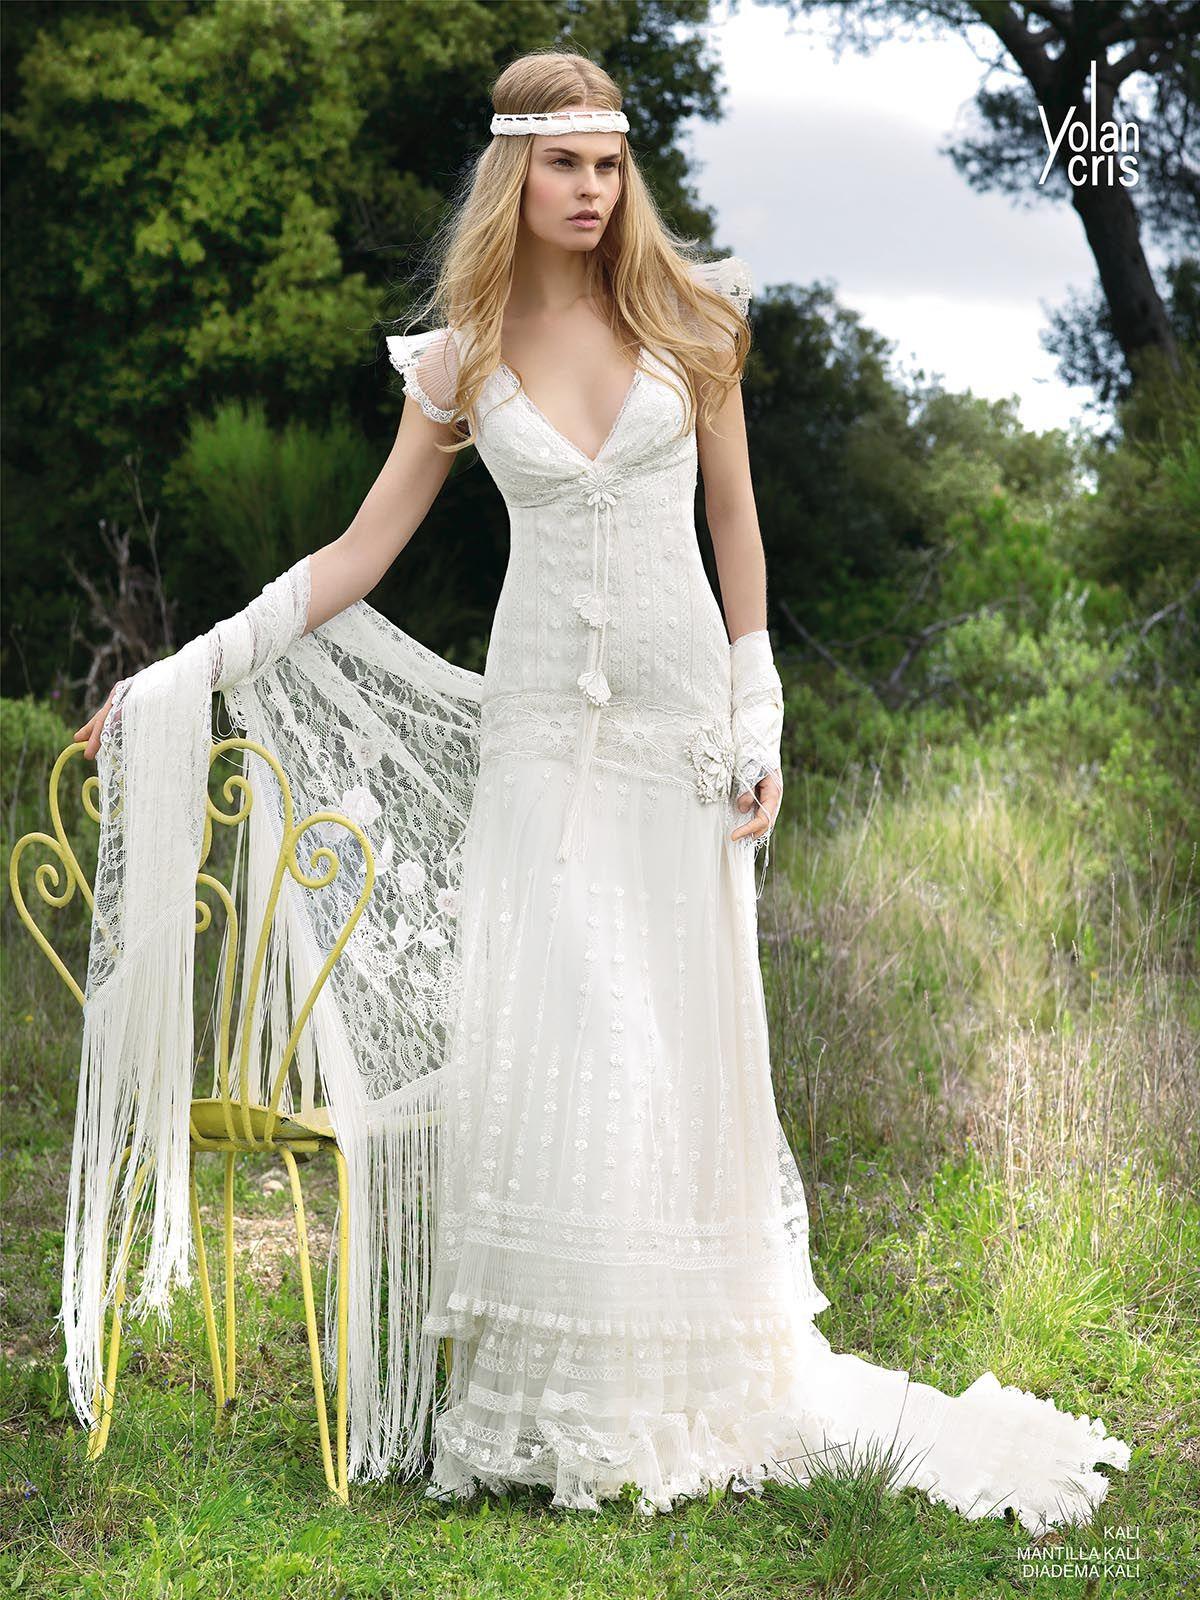 Thème hippy hippie robe de mariée